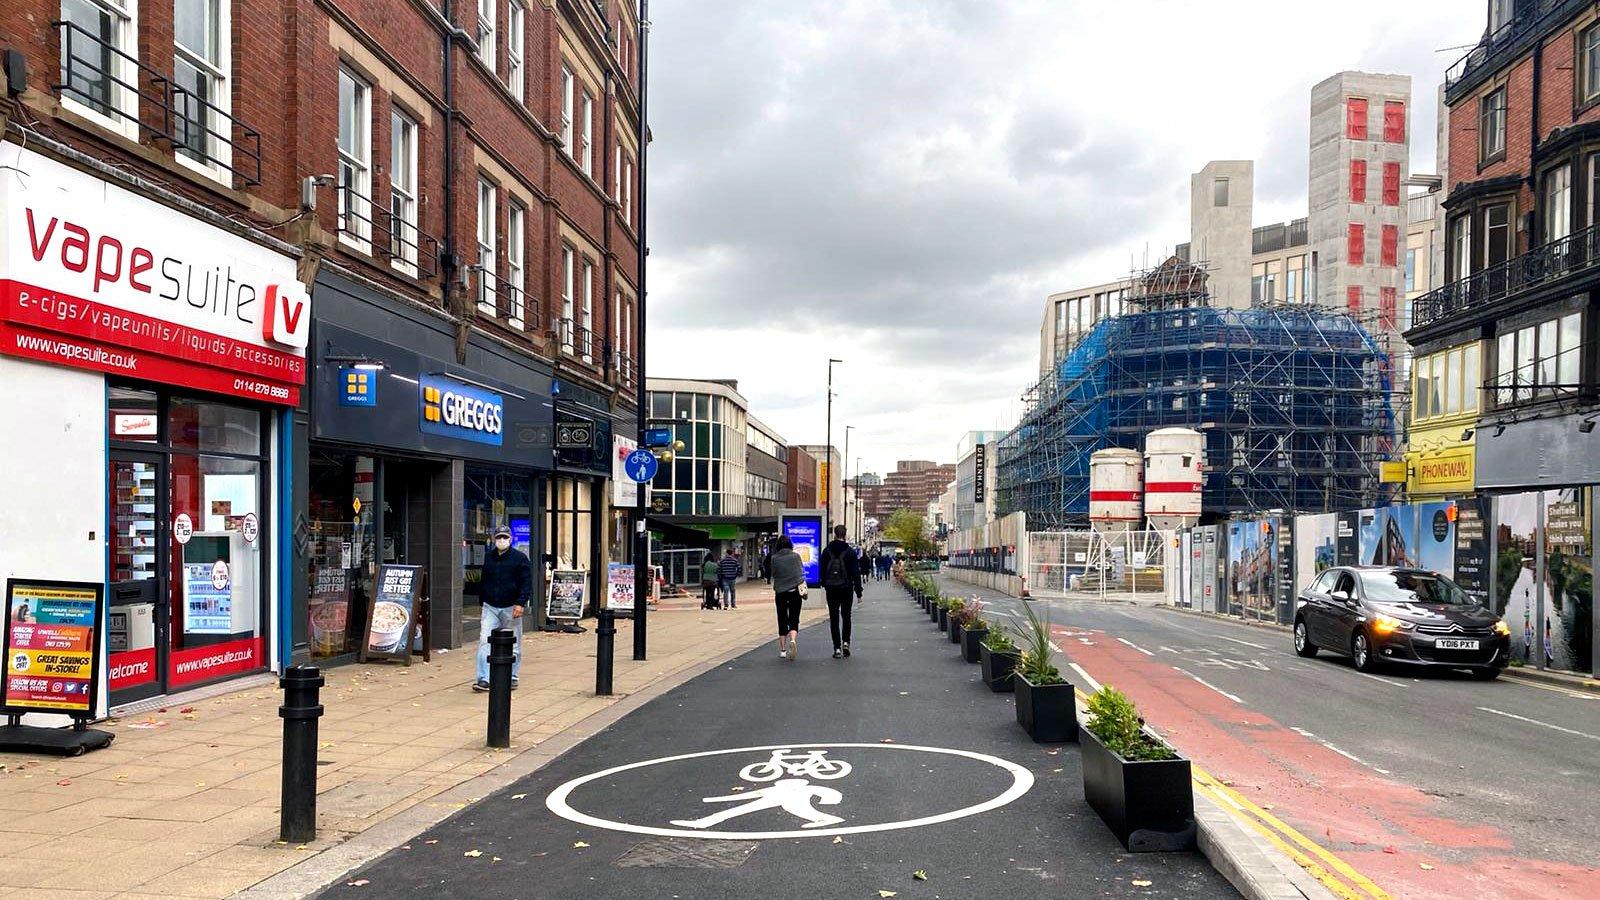 Pinstone Street Social Distancing Measures, October 2020